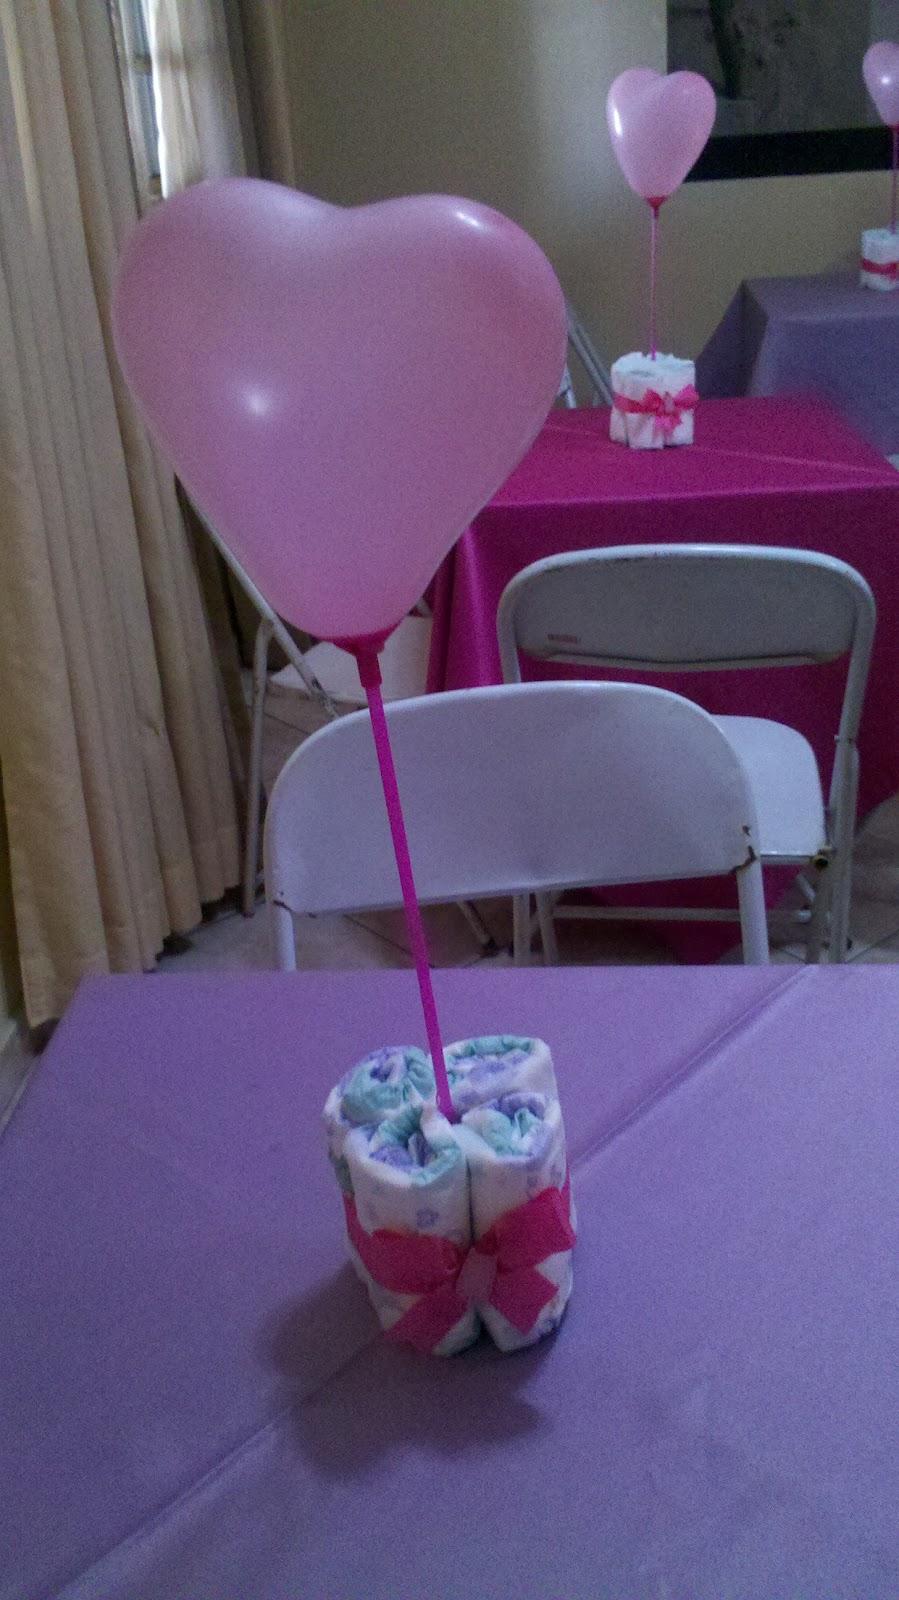 Centros mesa para baby despedida novedades fotolog hawaii - Novedades para baby shower ...